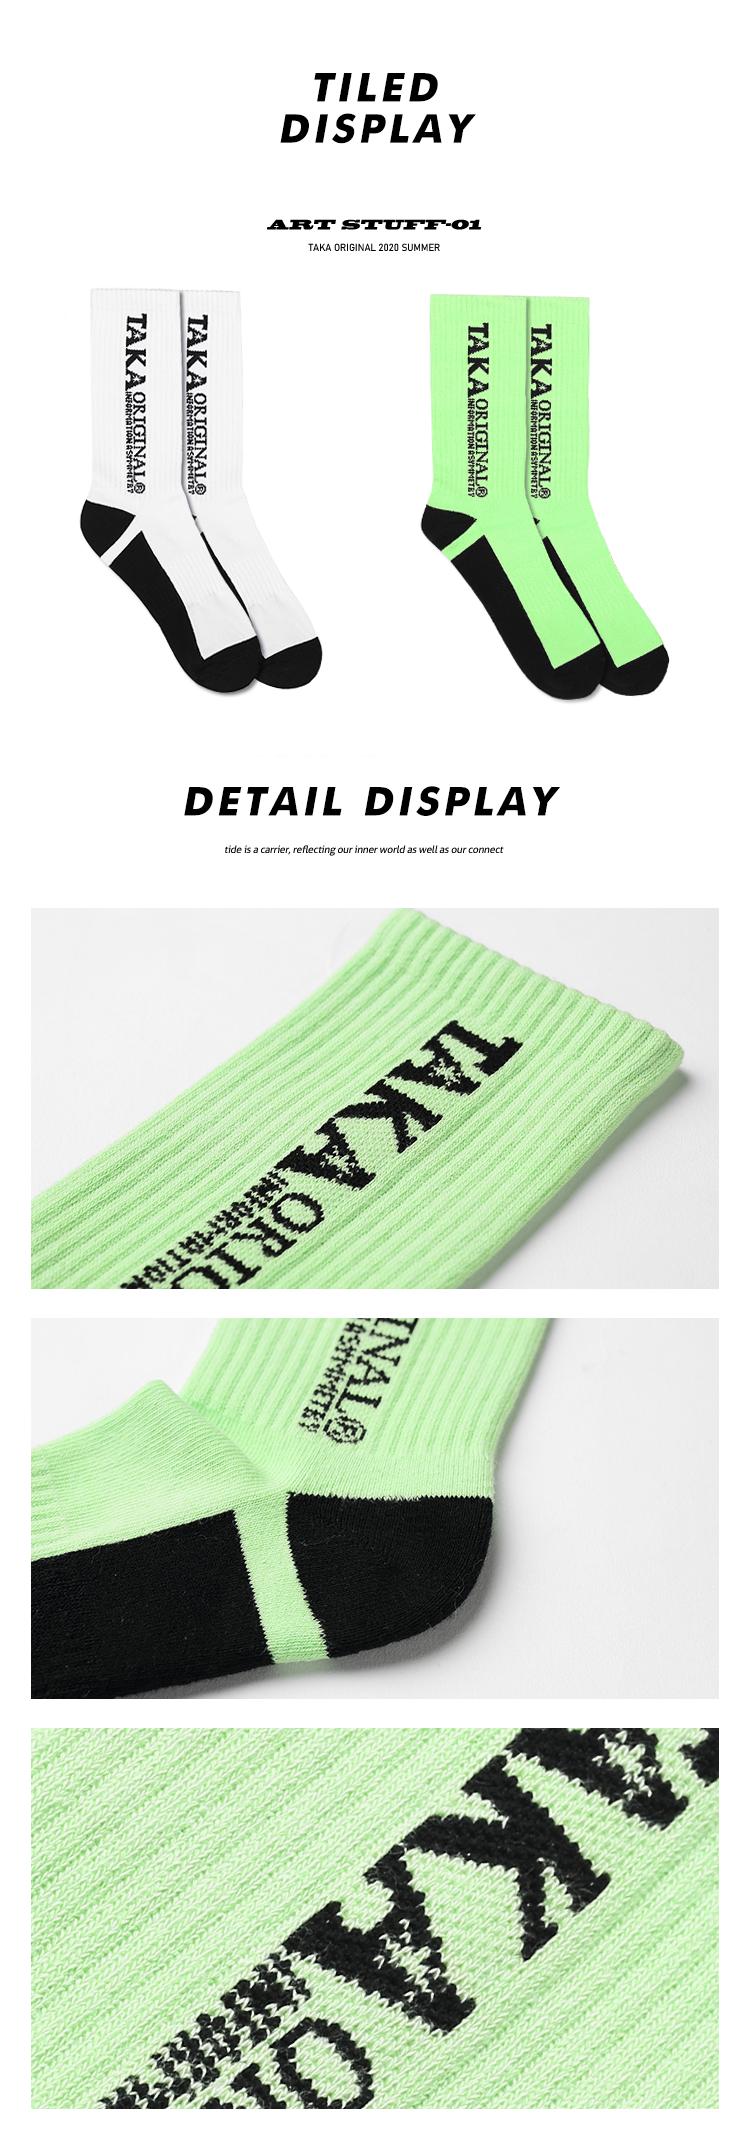 taka origianl 20ss style two-tone cotton blend sport socks for women and men